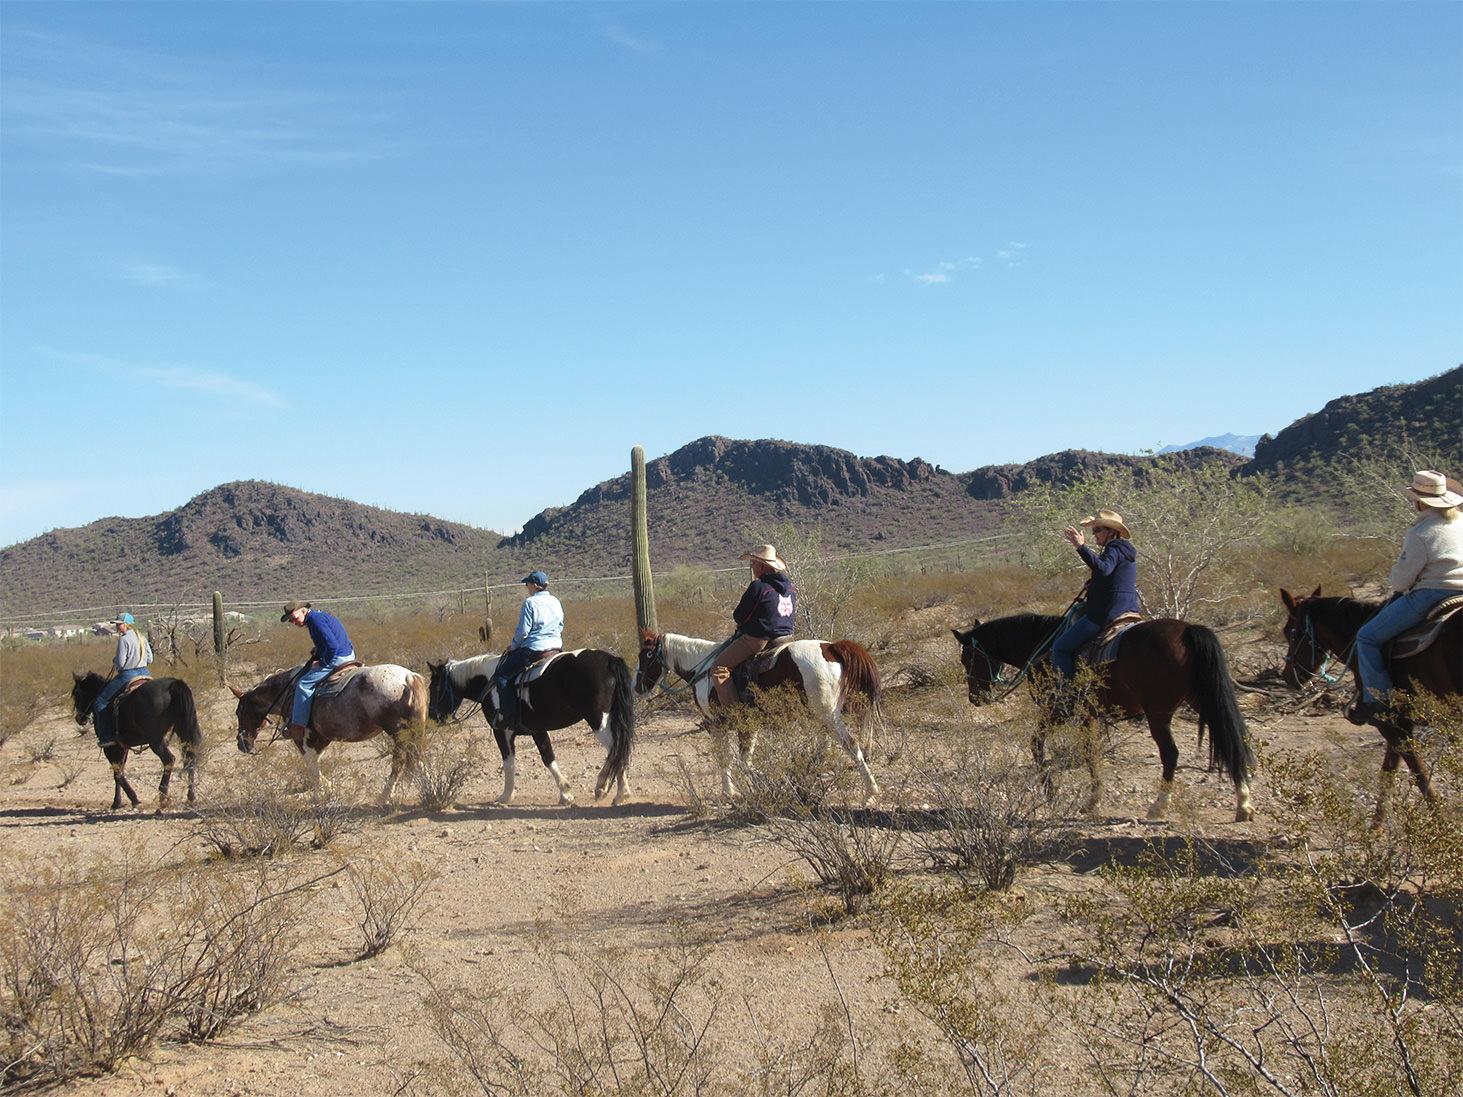 Left to right: Wrangler, Jeff Smith, Nancy Gruca, Rob Densmore, Judy Smith, and Tess Densmore enjoy the trail.